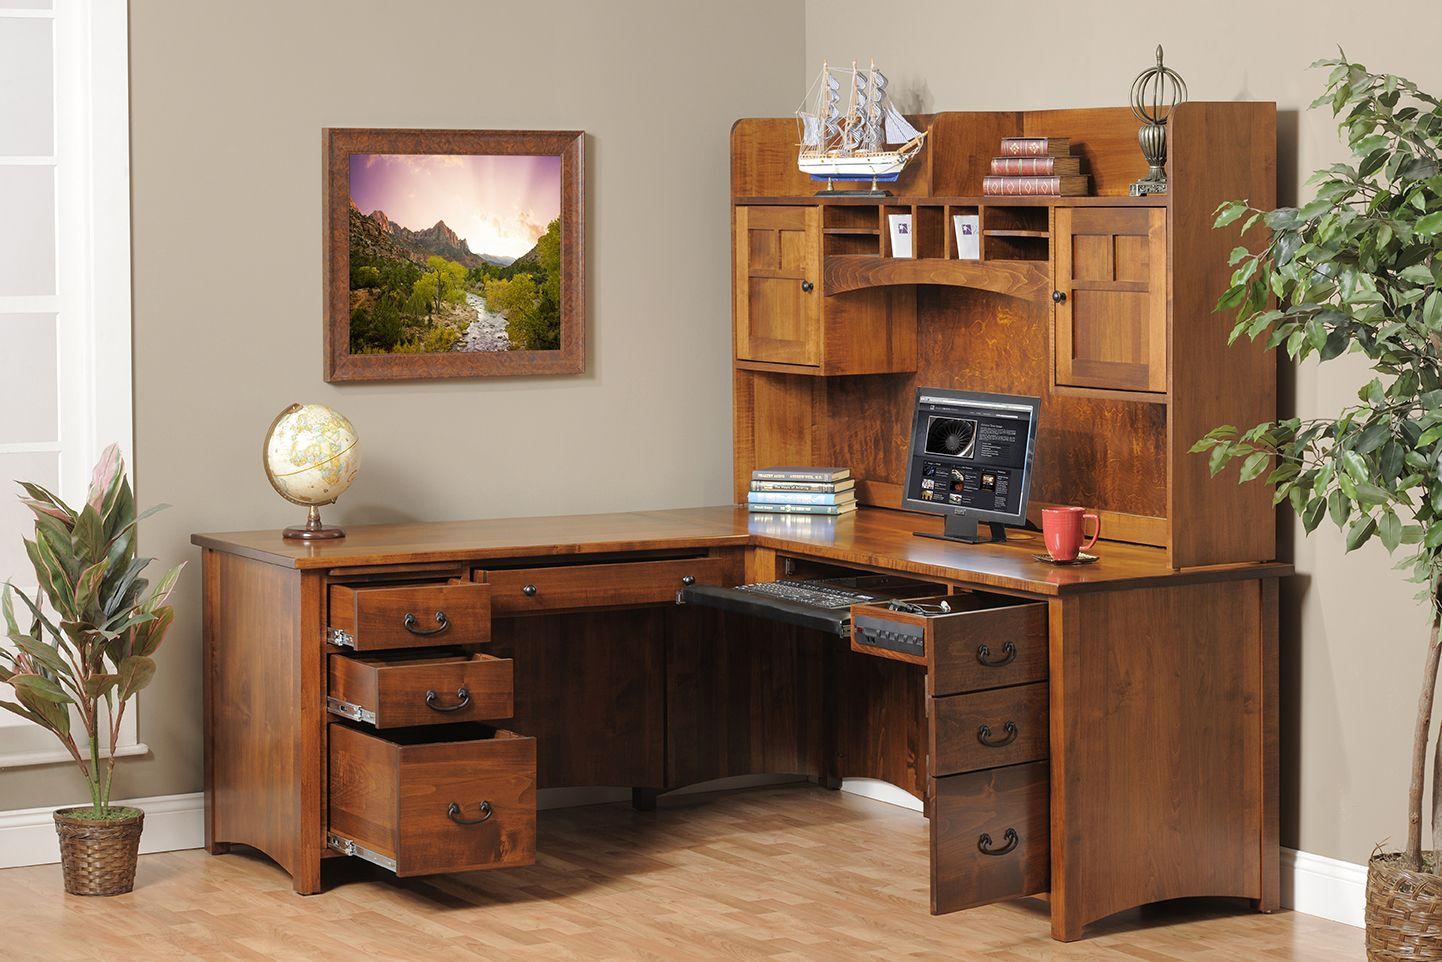 Diy Corner Computer Desk For Those Of You Who Like To